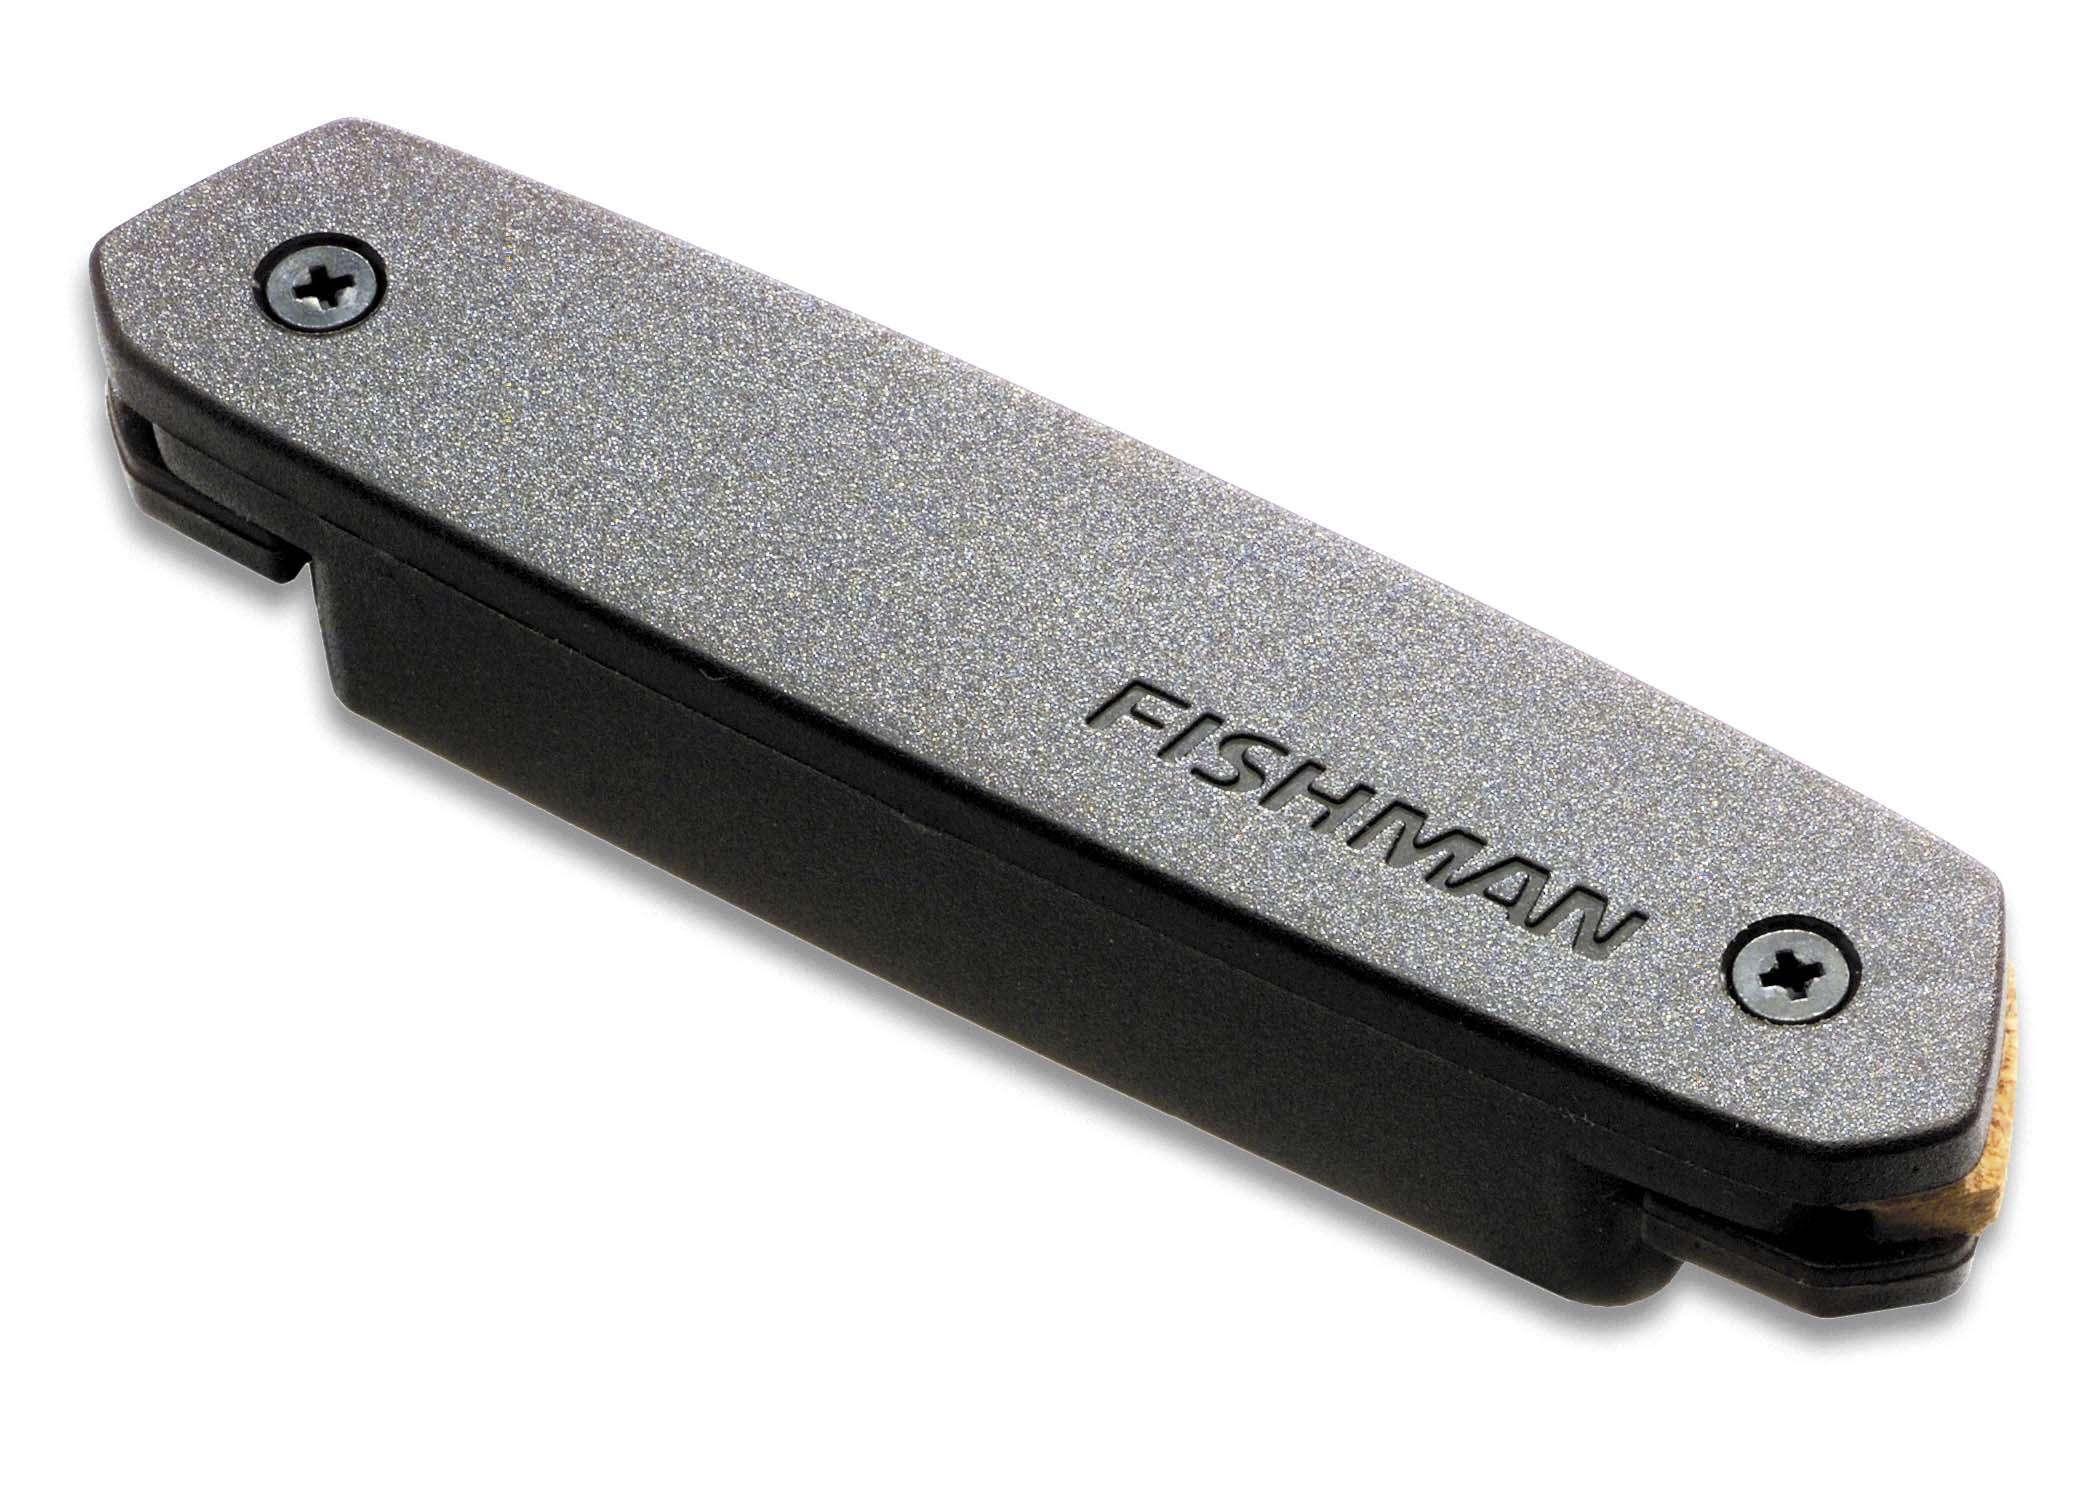 fishman neo d passive magnetic humbucker guitar soundhole pickup. Black Bedroom Furniture Sets. Home Design Ideas